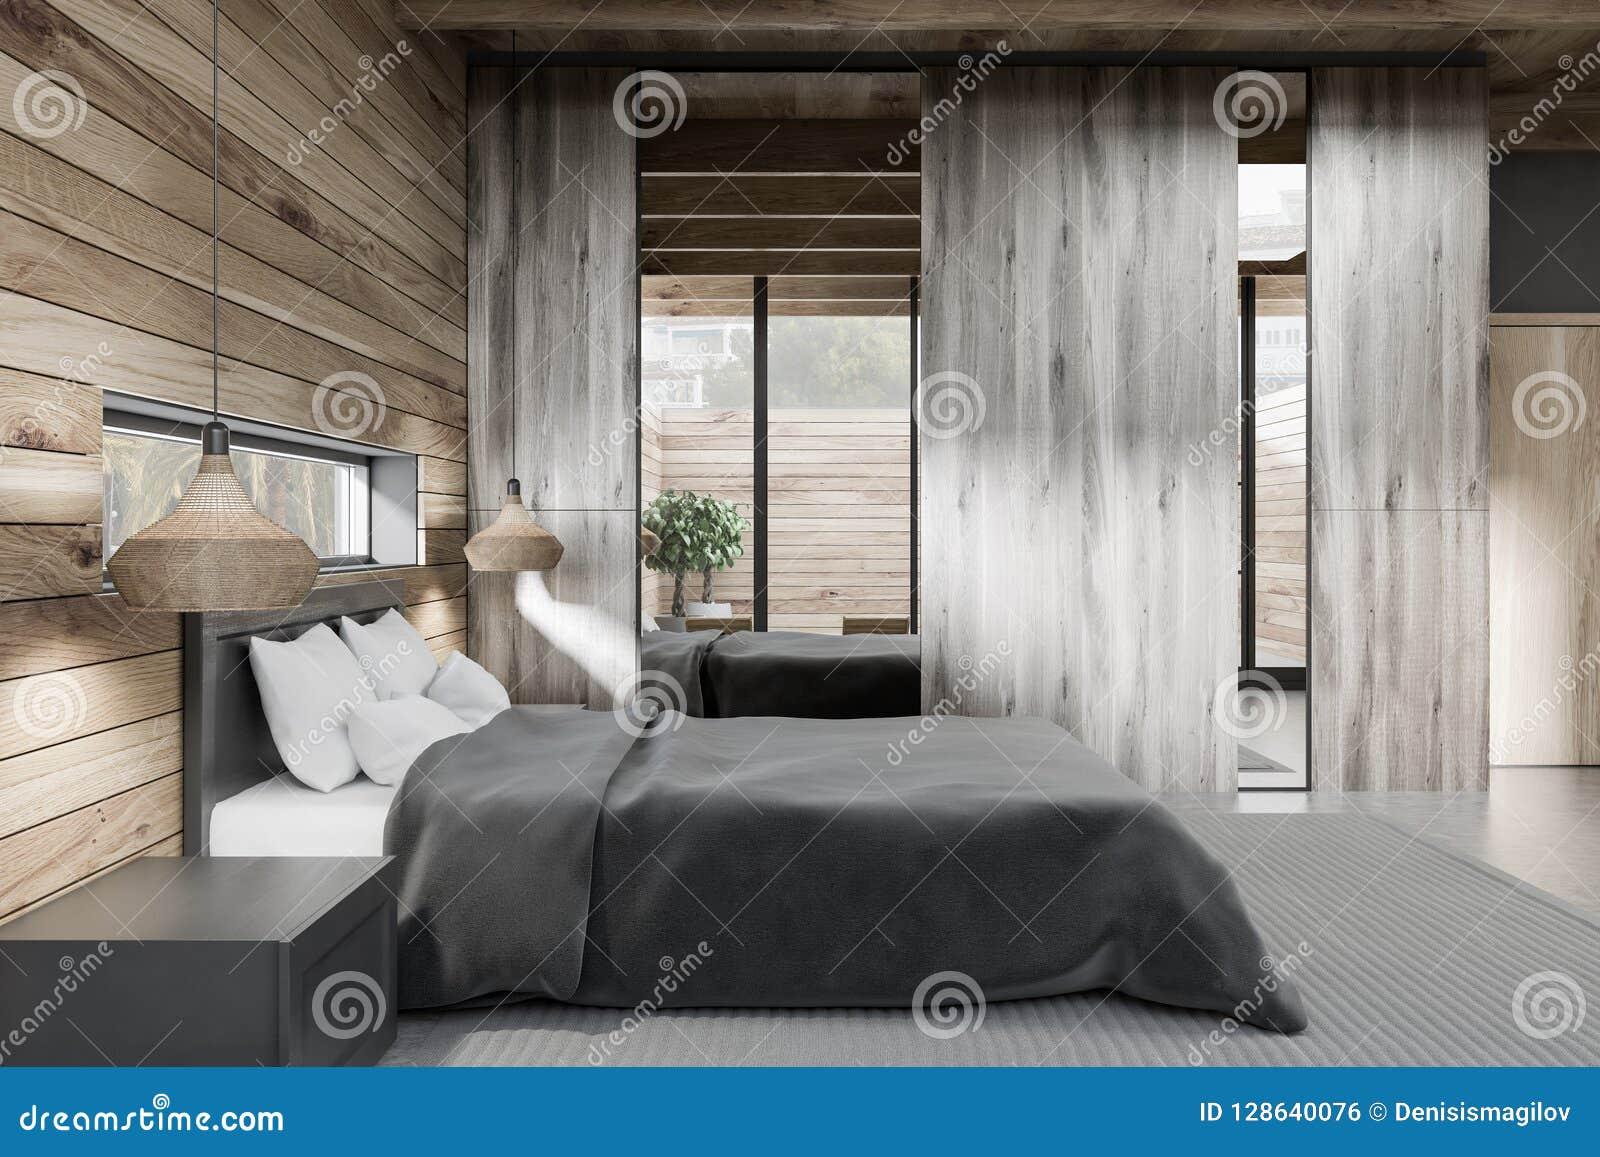 Wooden Master Bedroom Interior Side View Stock Illustration